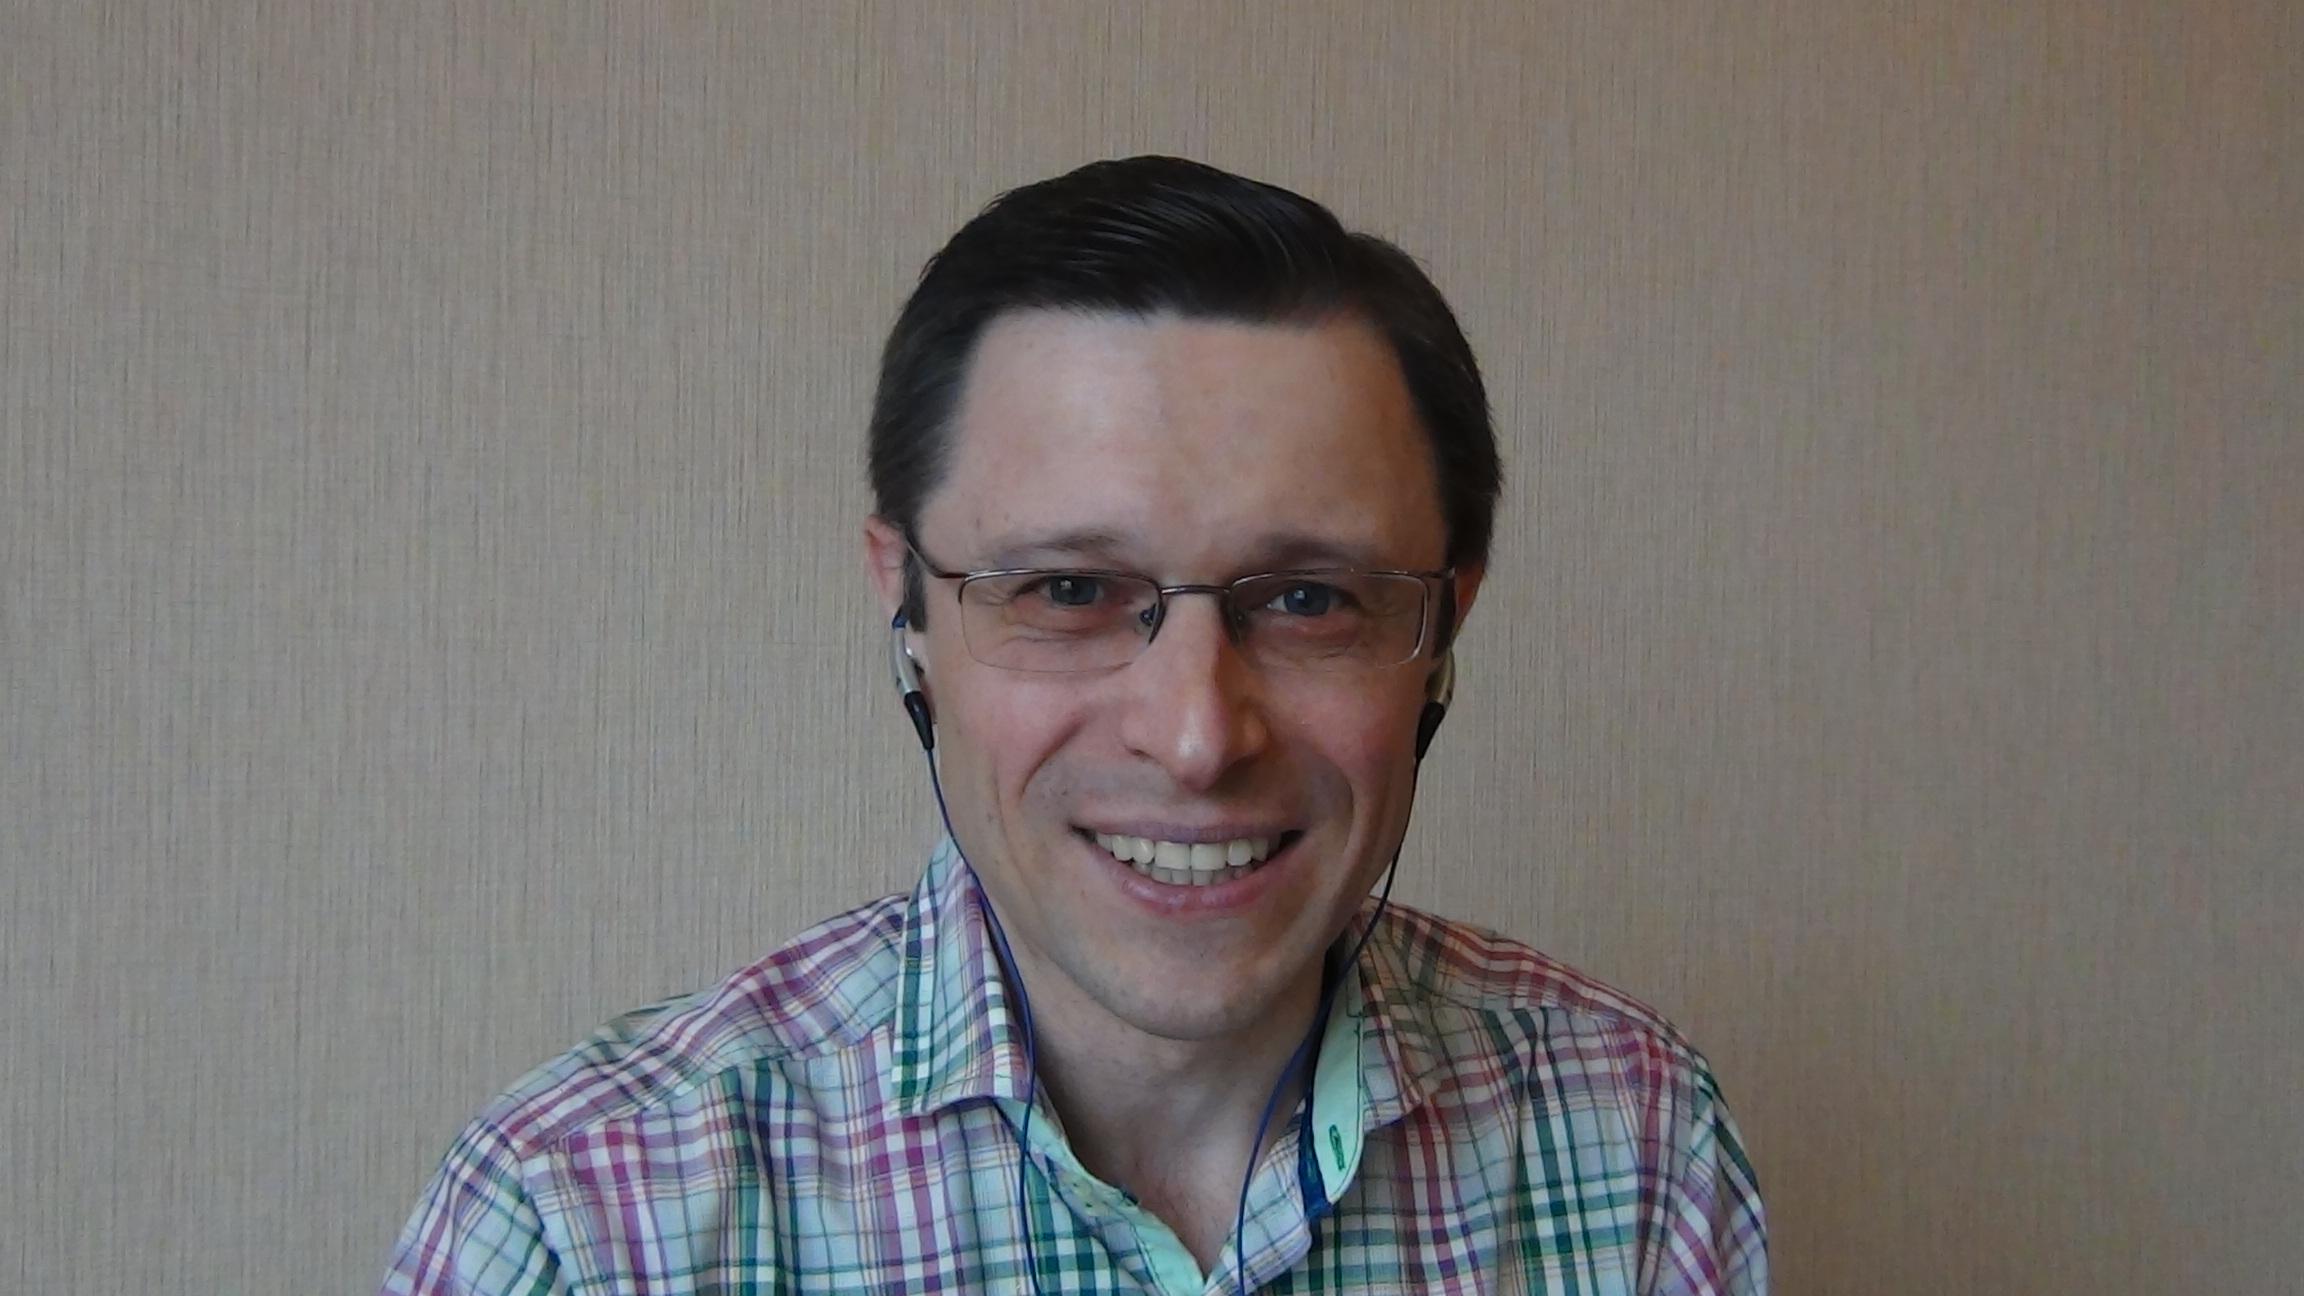 lisyanskiy-konstantin-20140528